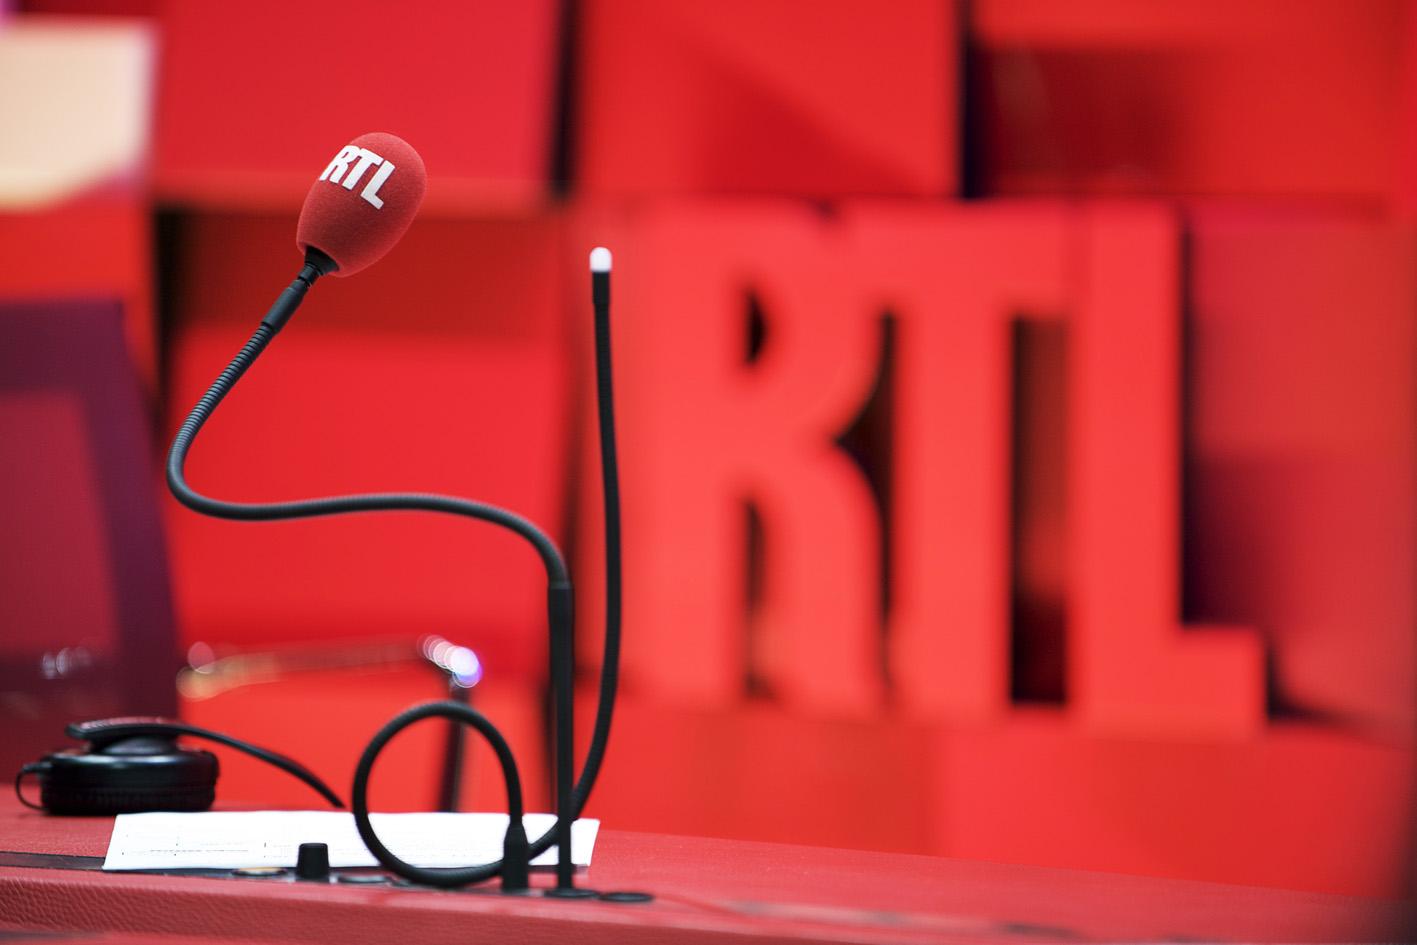 RTL : première radio en Ile-de-France